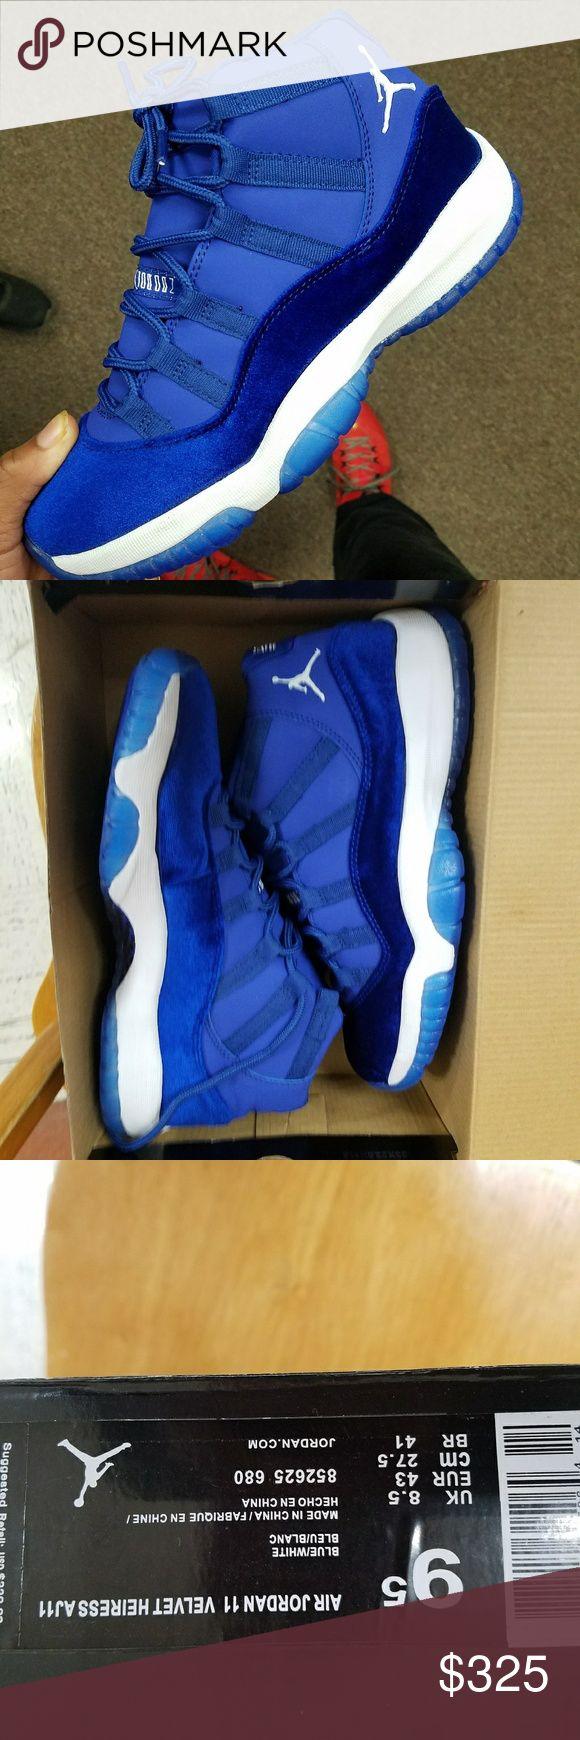 Custom Blue Jordan Heiress 11s Brand new. Never been worn. Jordan Shoes Sneakers